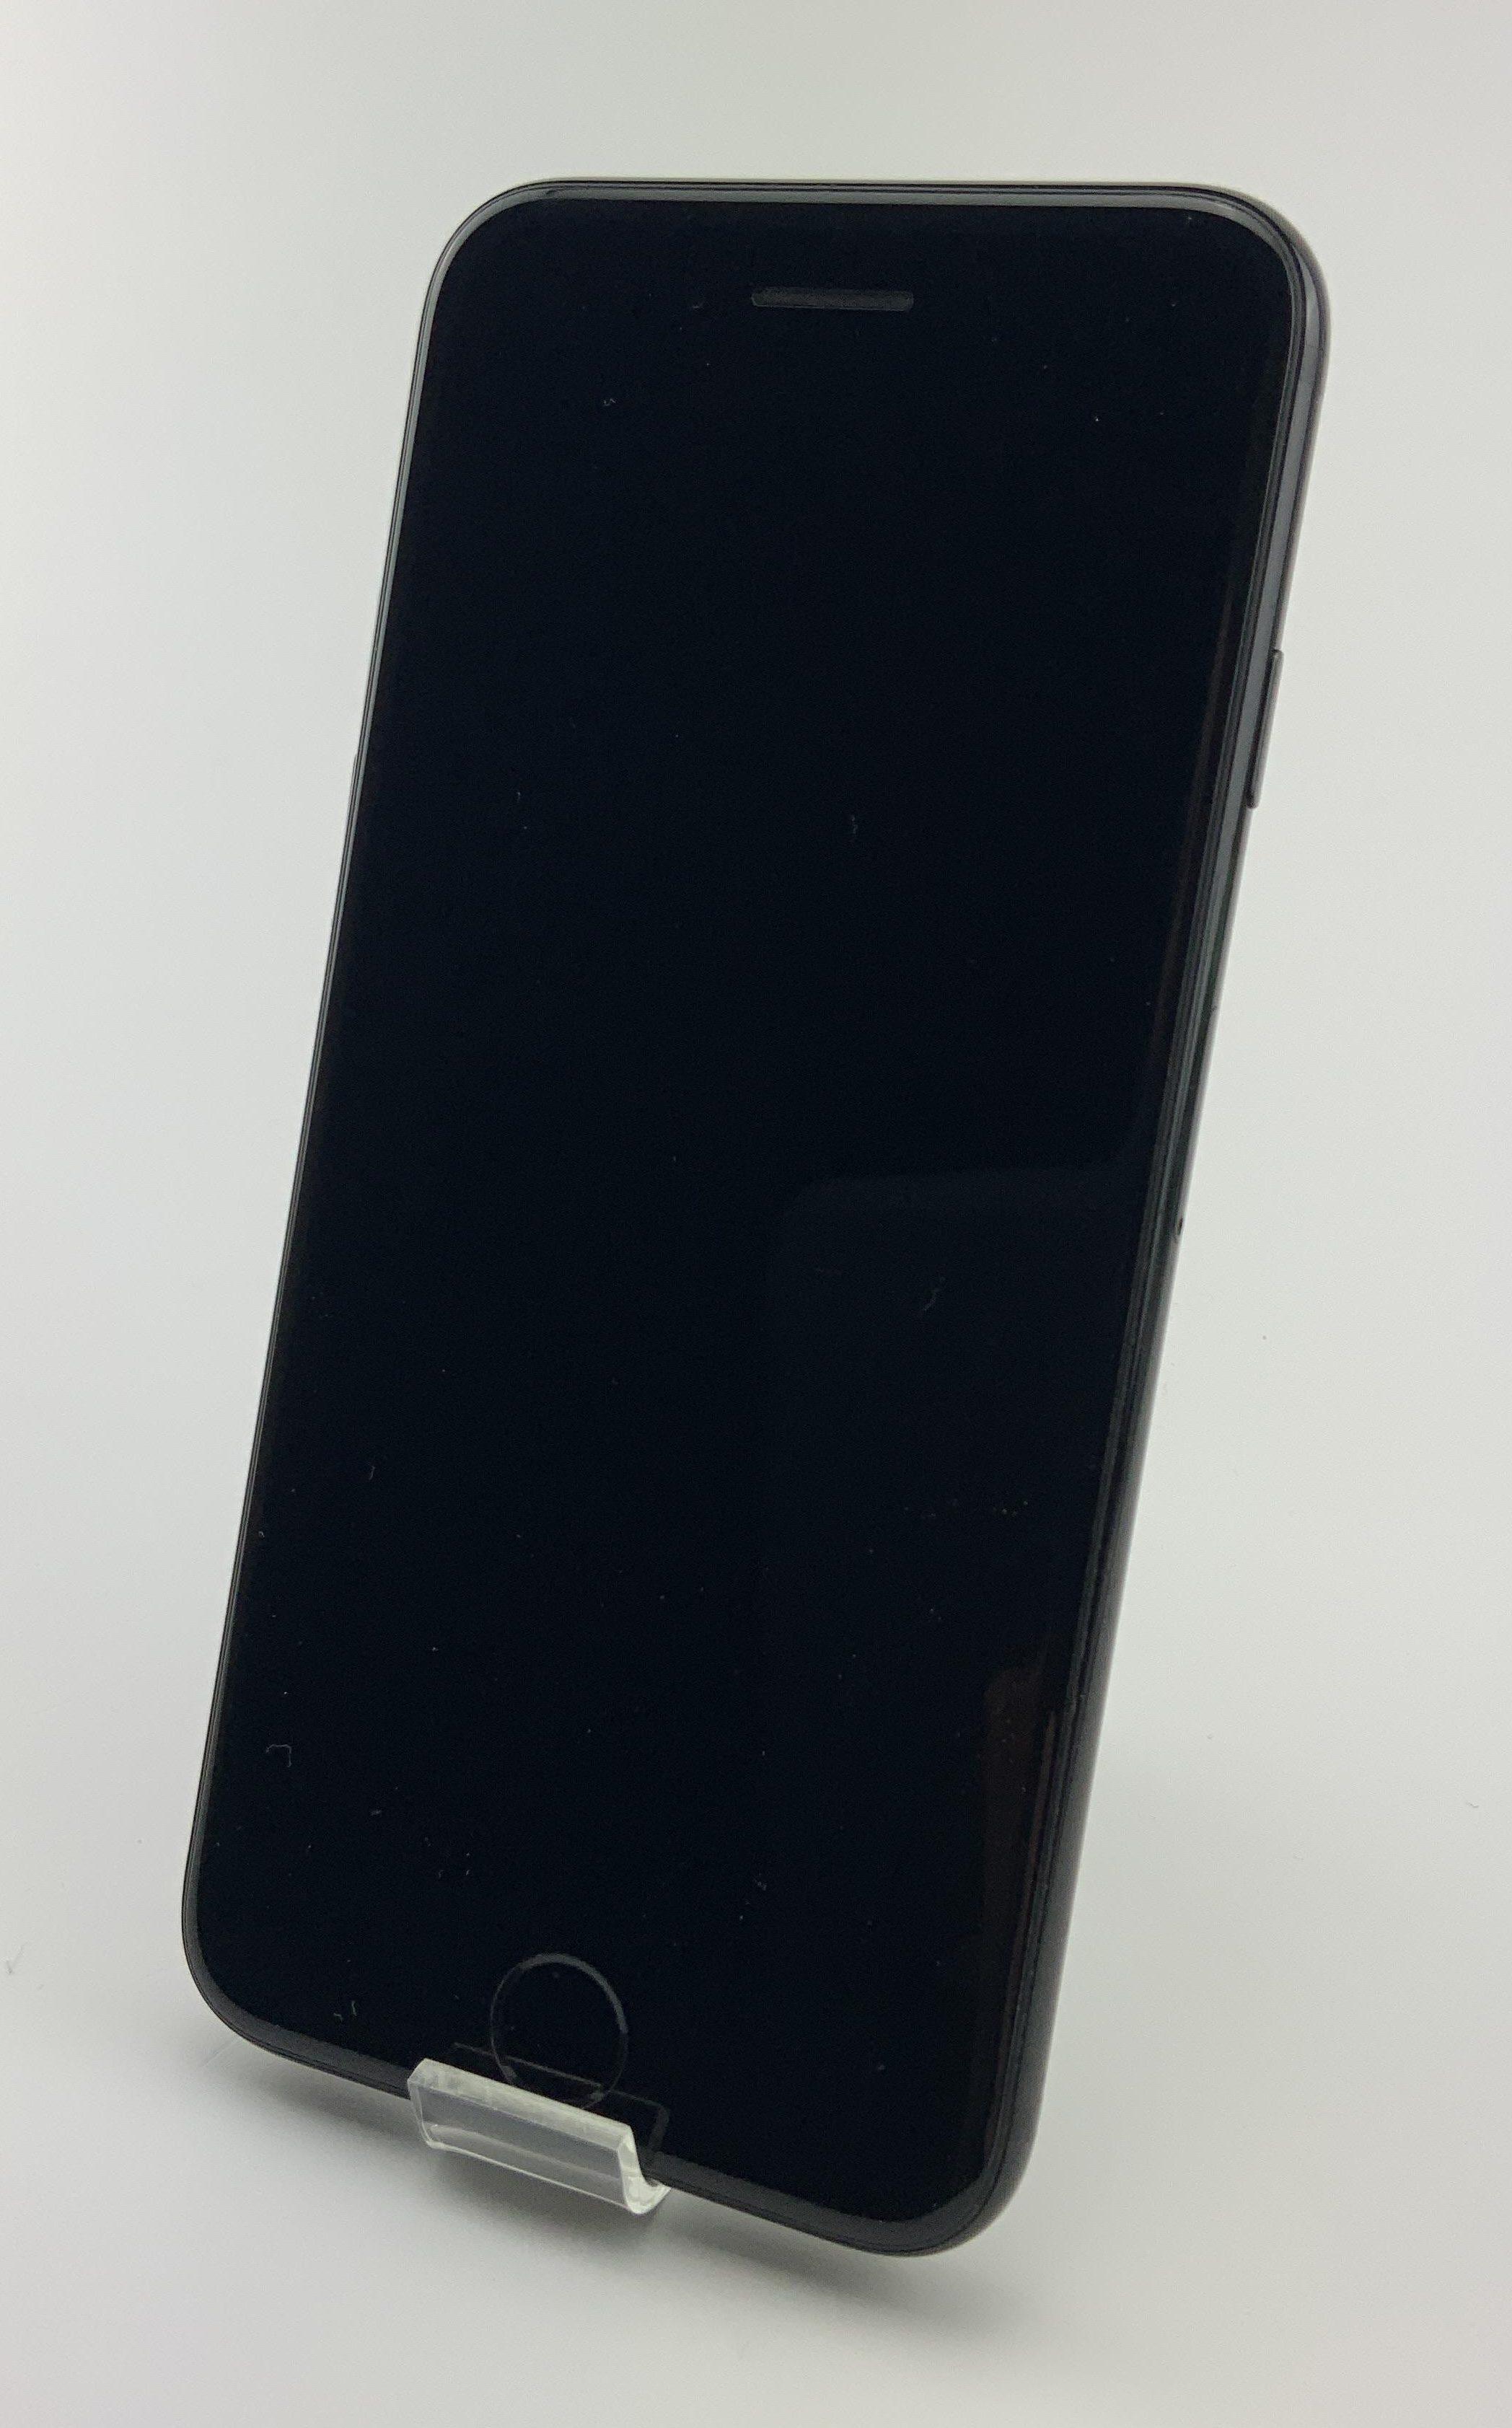 iPhone 7 128GB, 128GB, Jet Black, Kuva 1